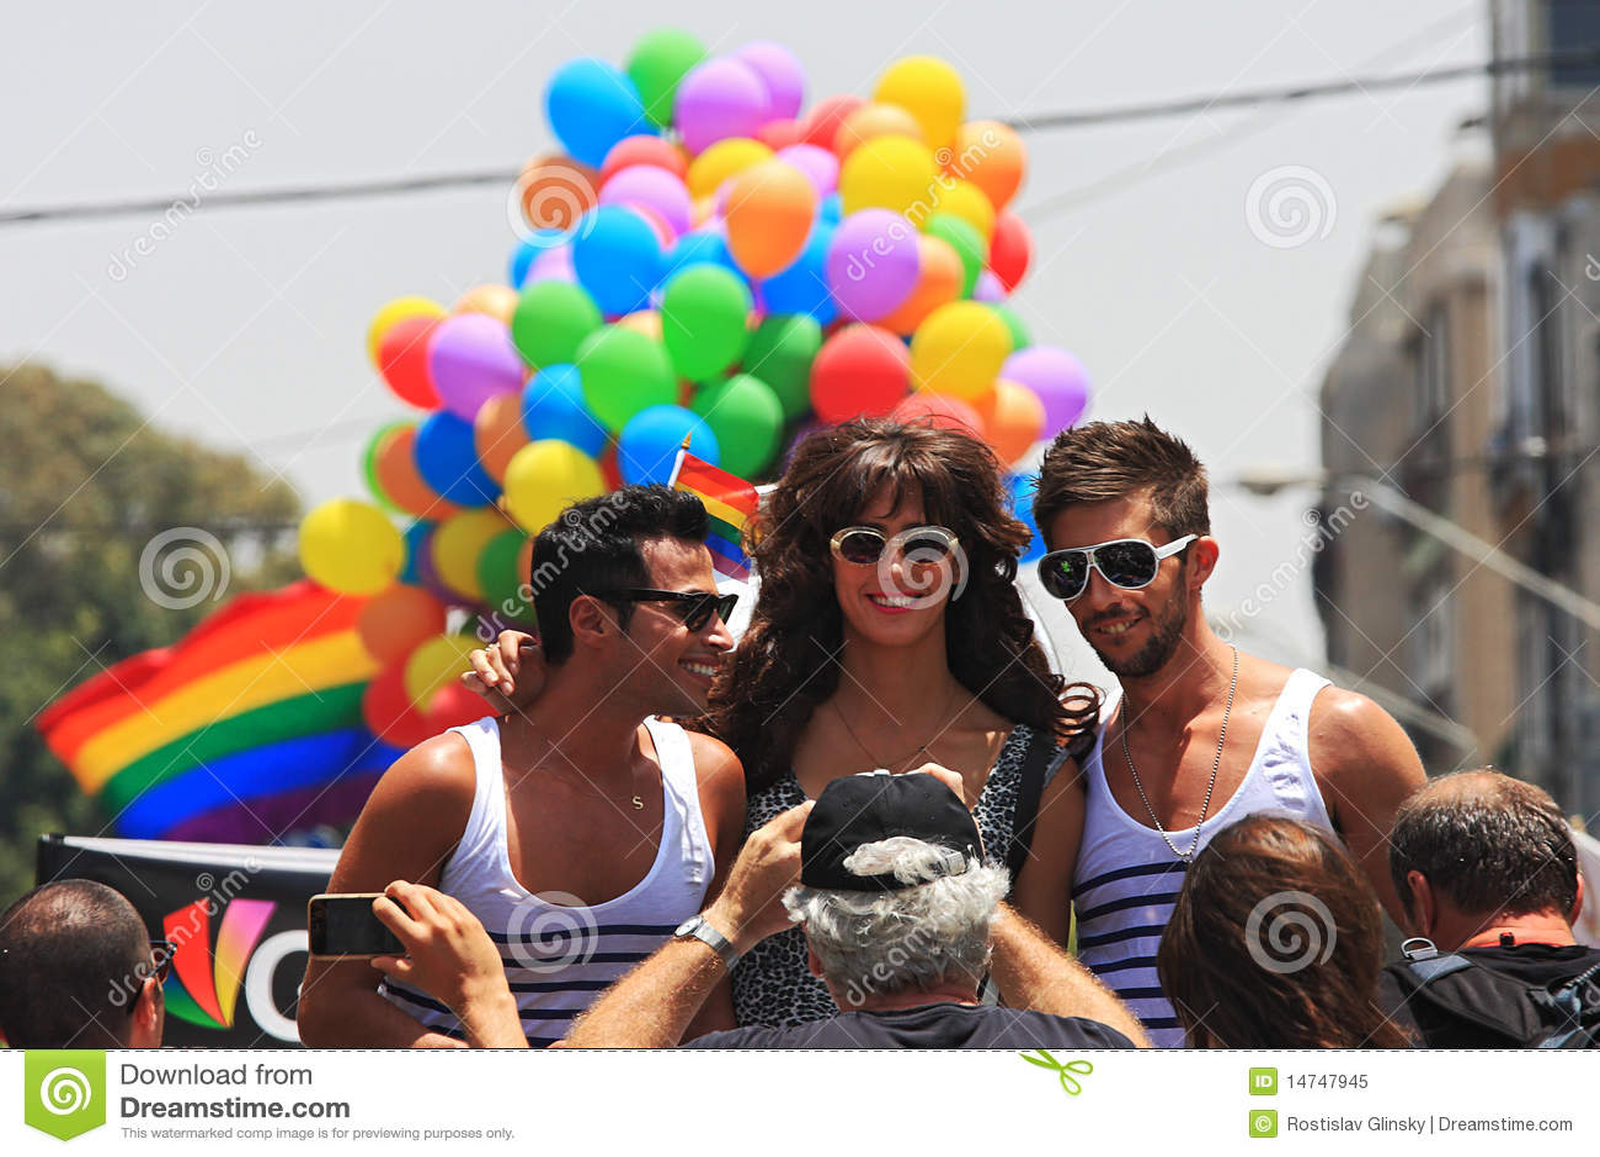 Gay Pride Parade in Tel Aviv, Israel.